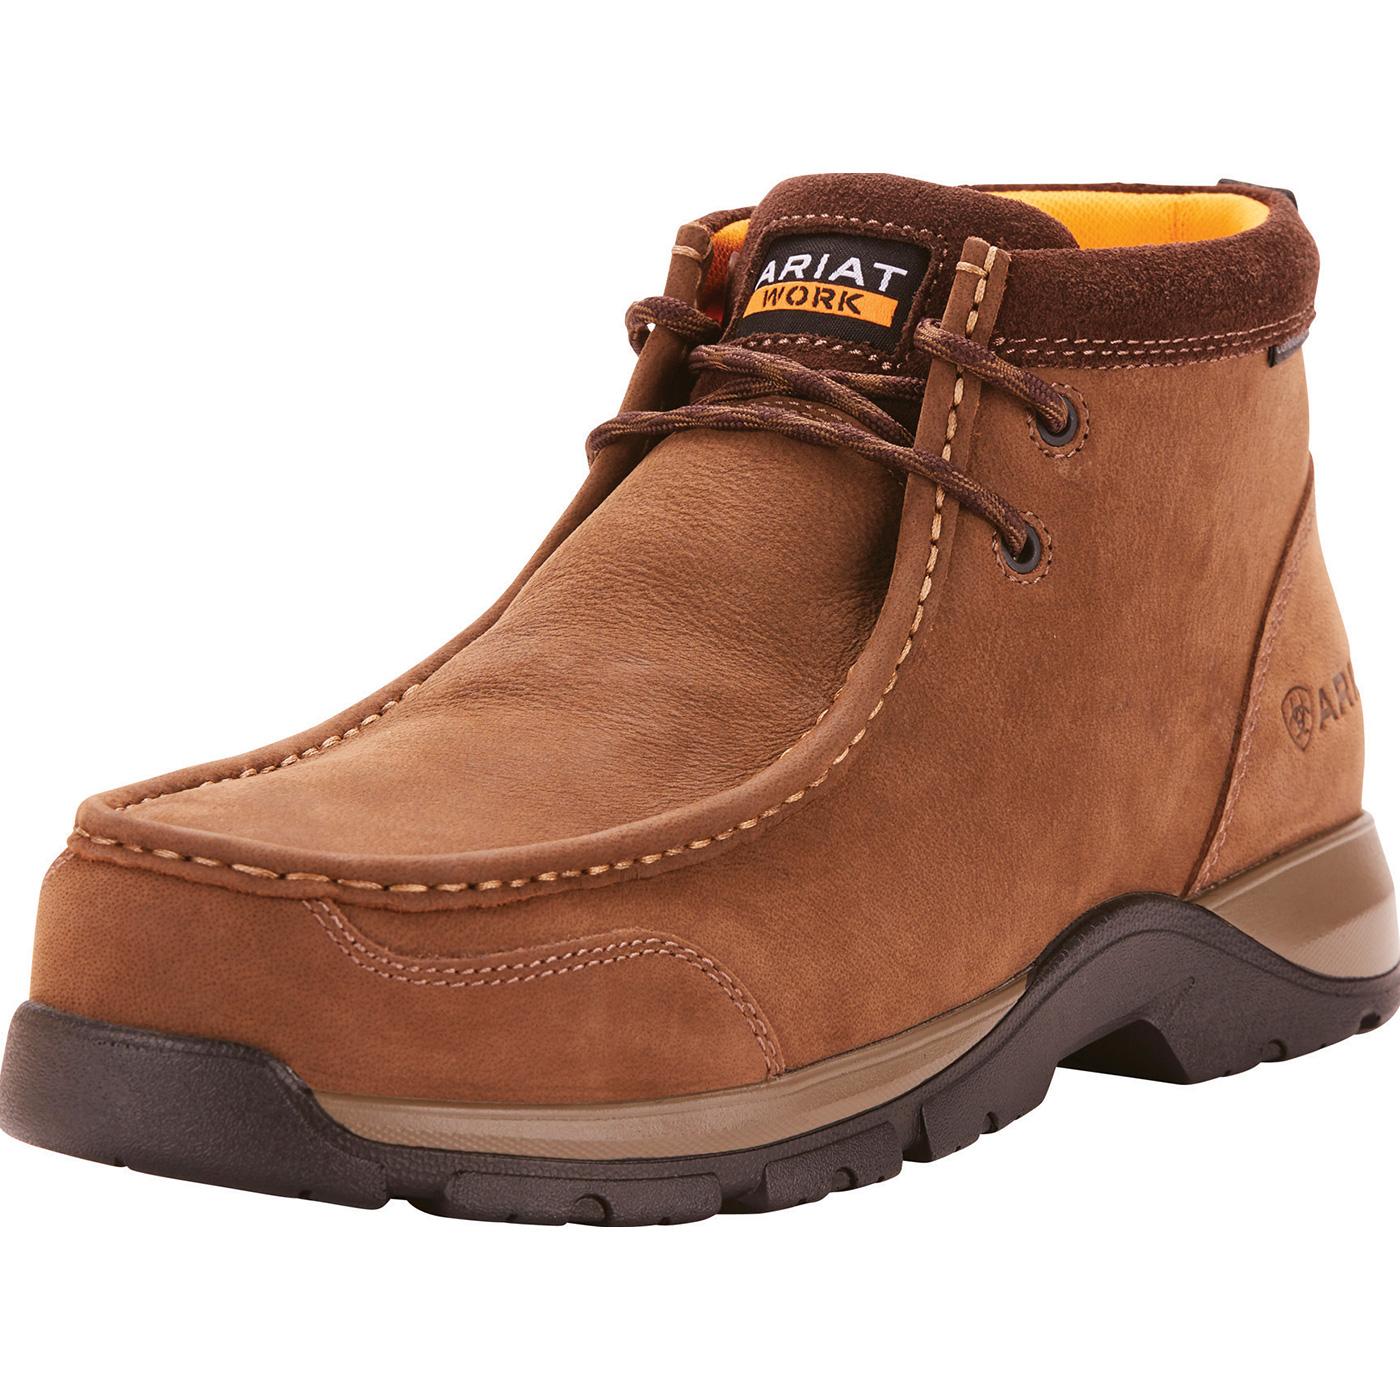 3d58fac7815 Ariat Edge LTE Men's 4.5 inch Composite Moc Toe Electrical Hazard Work Shoe